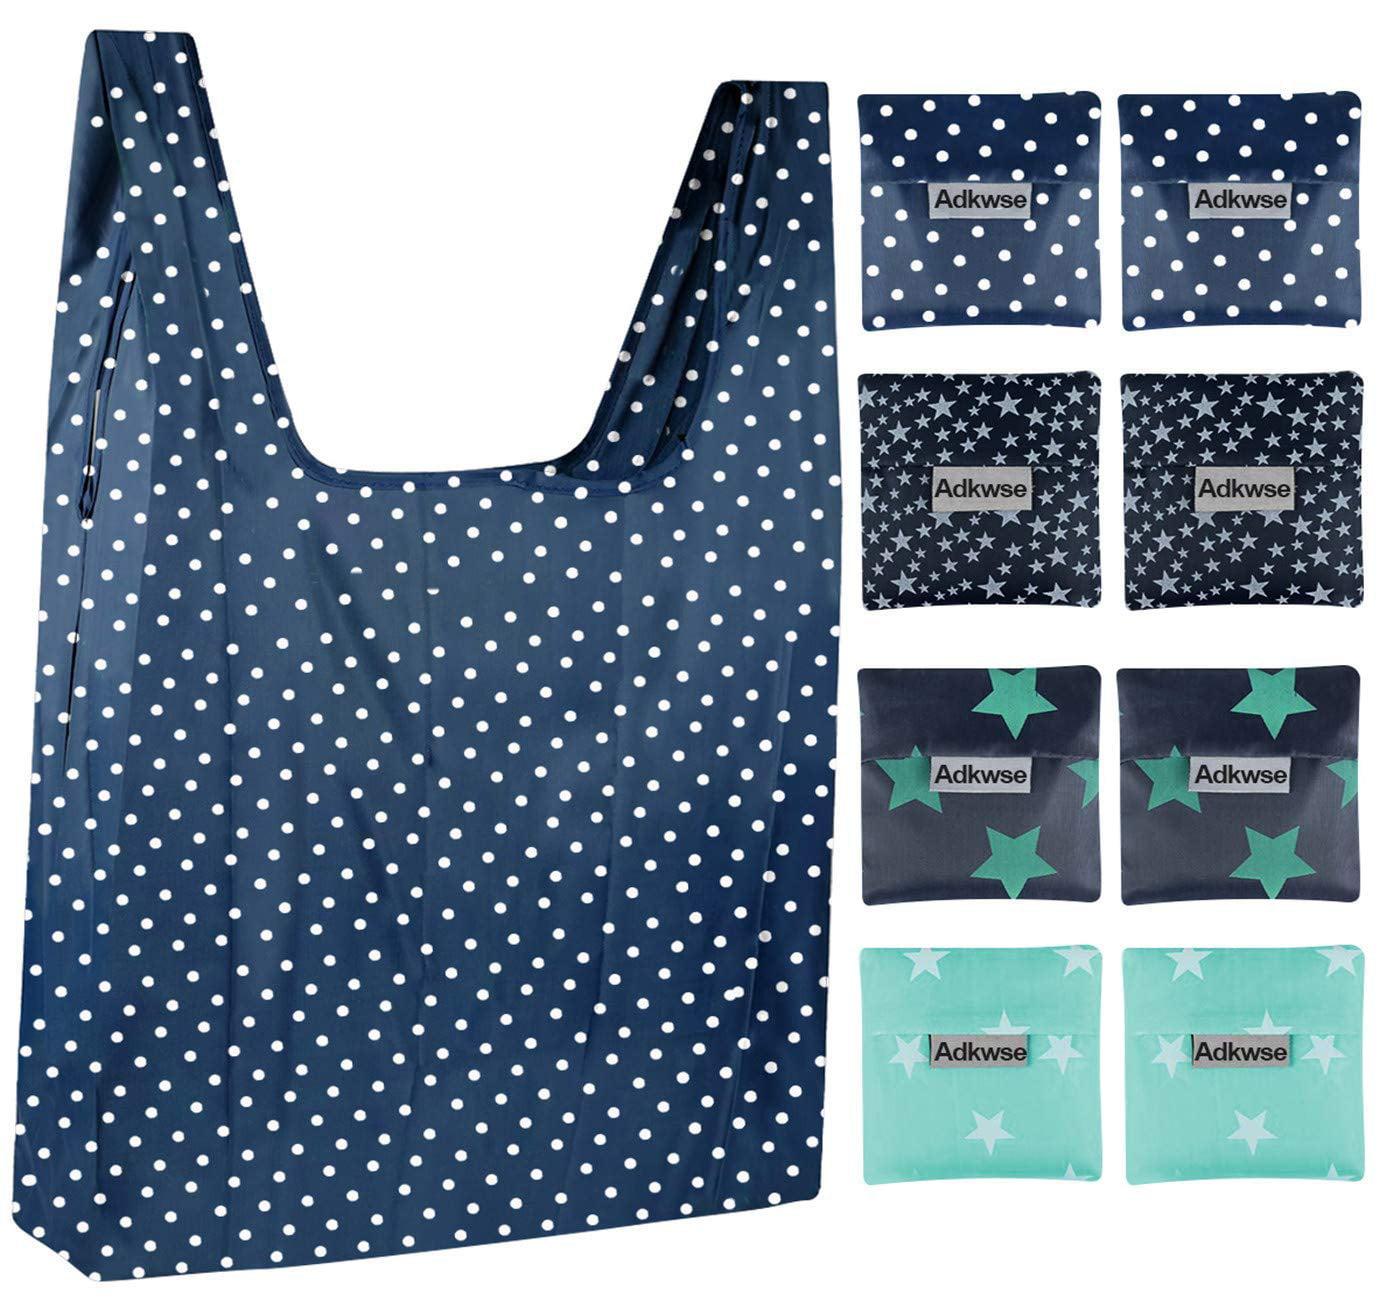 Designer Inspired Convertible Foldable Nylon Shopping Tote Bag